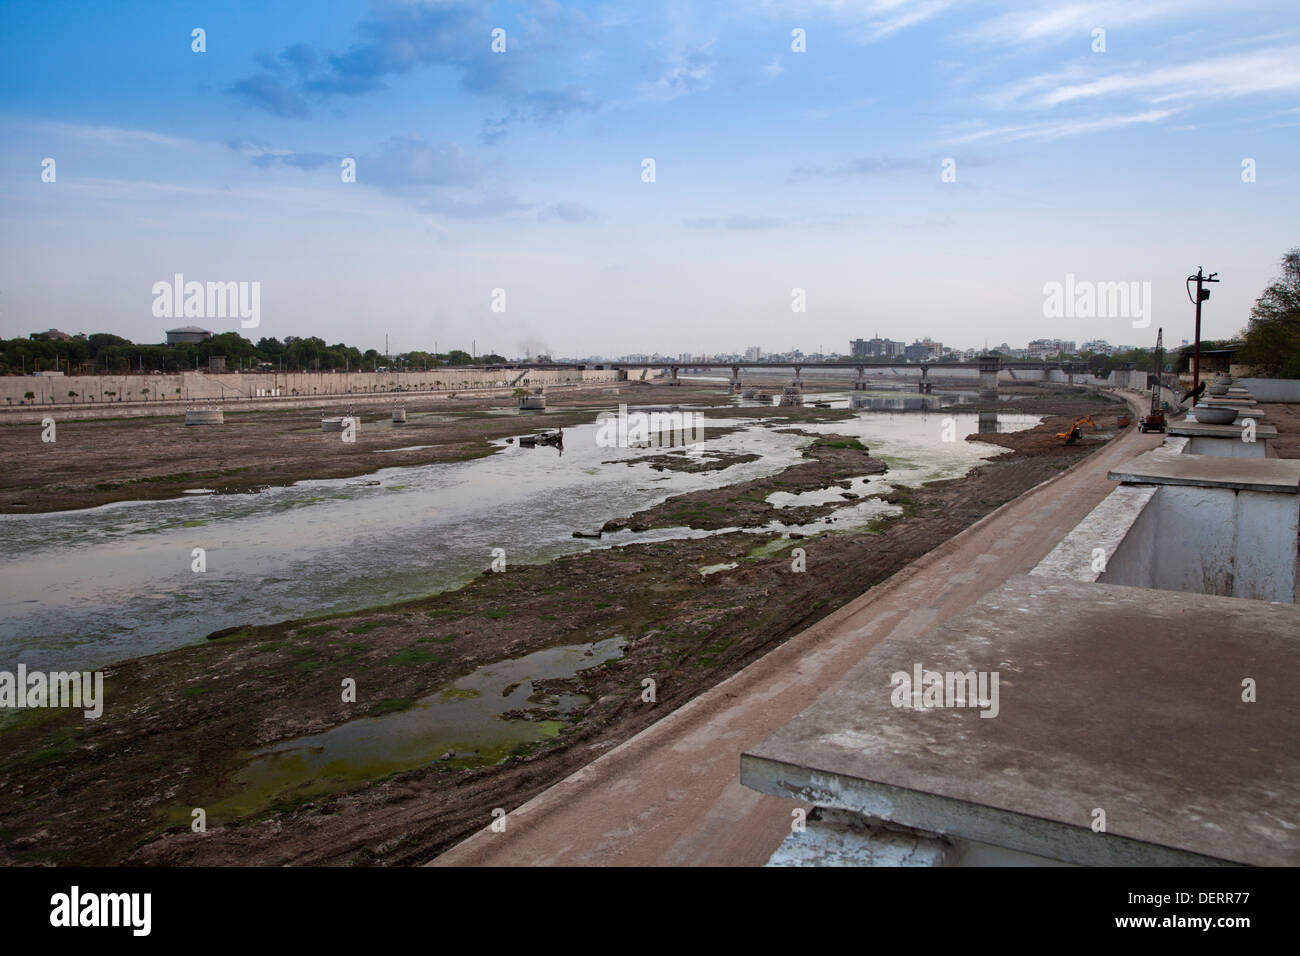 Sabarmati Riverfront, Ahmedabad, Gujarat, India - Stock Image